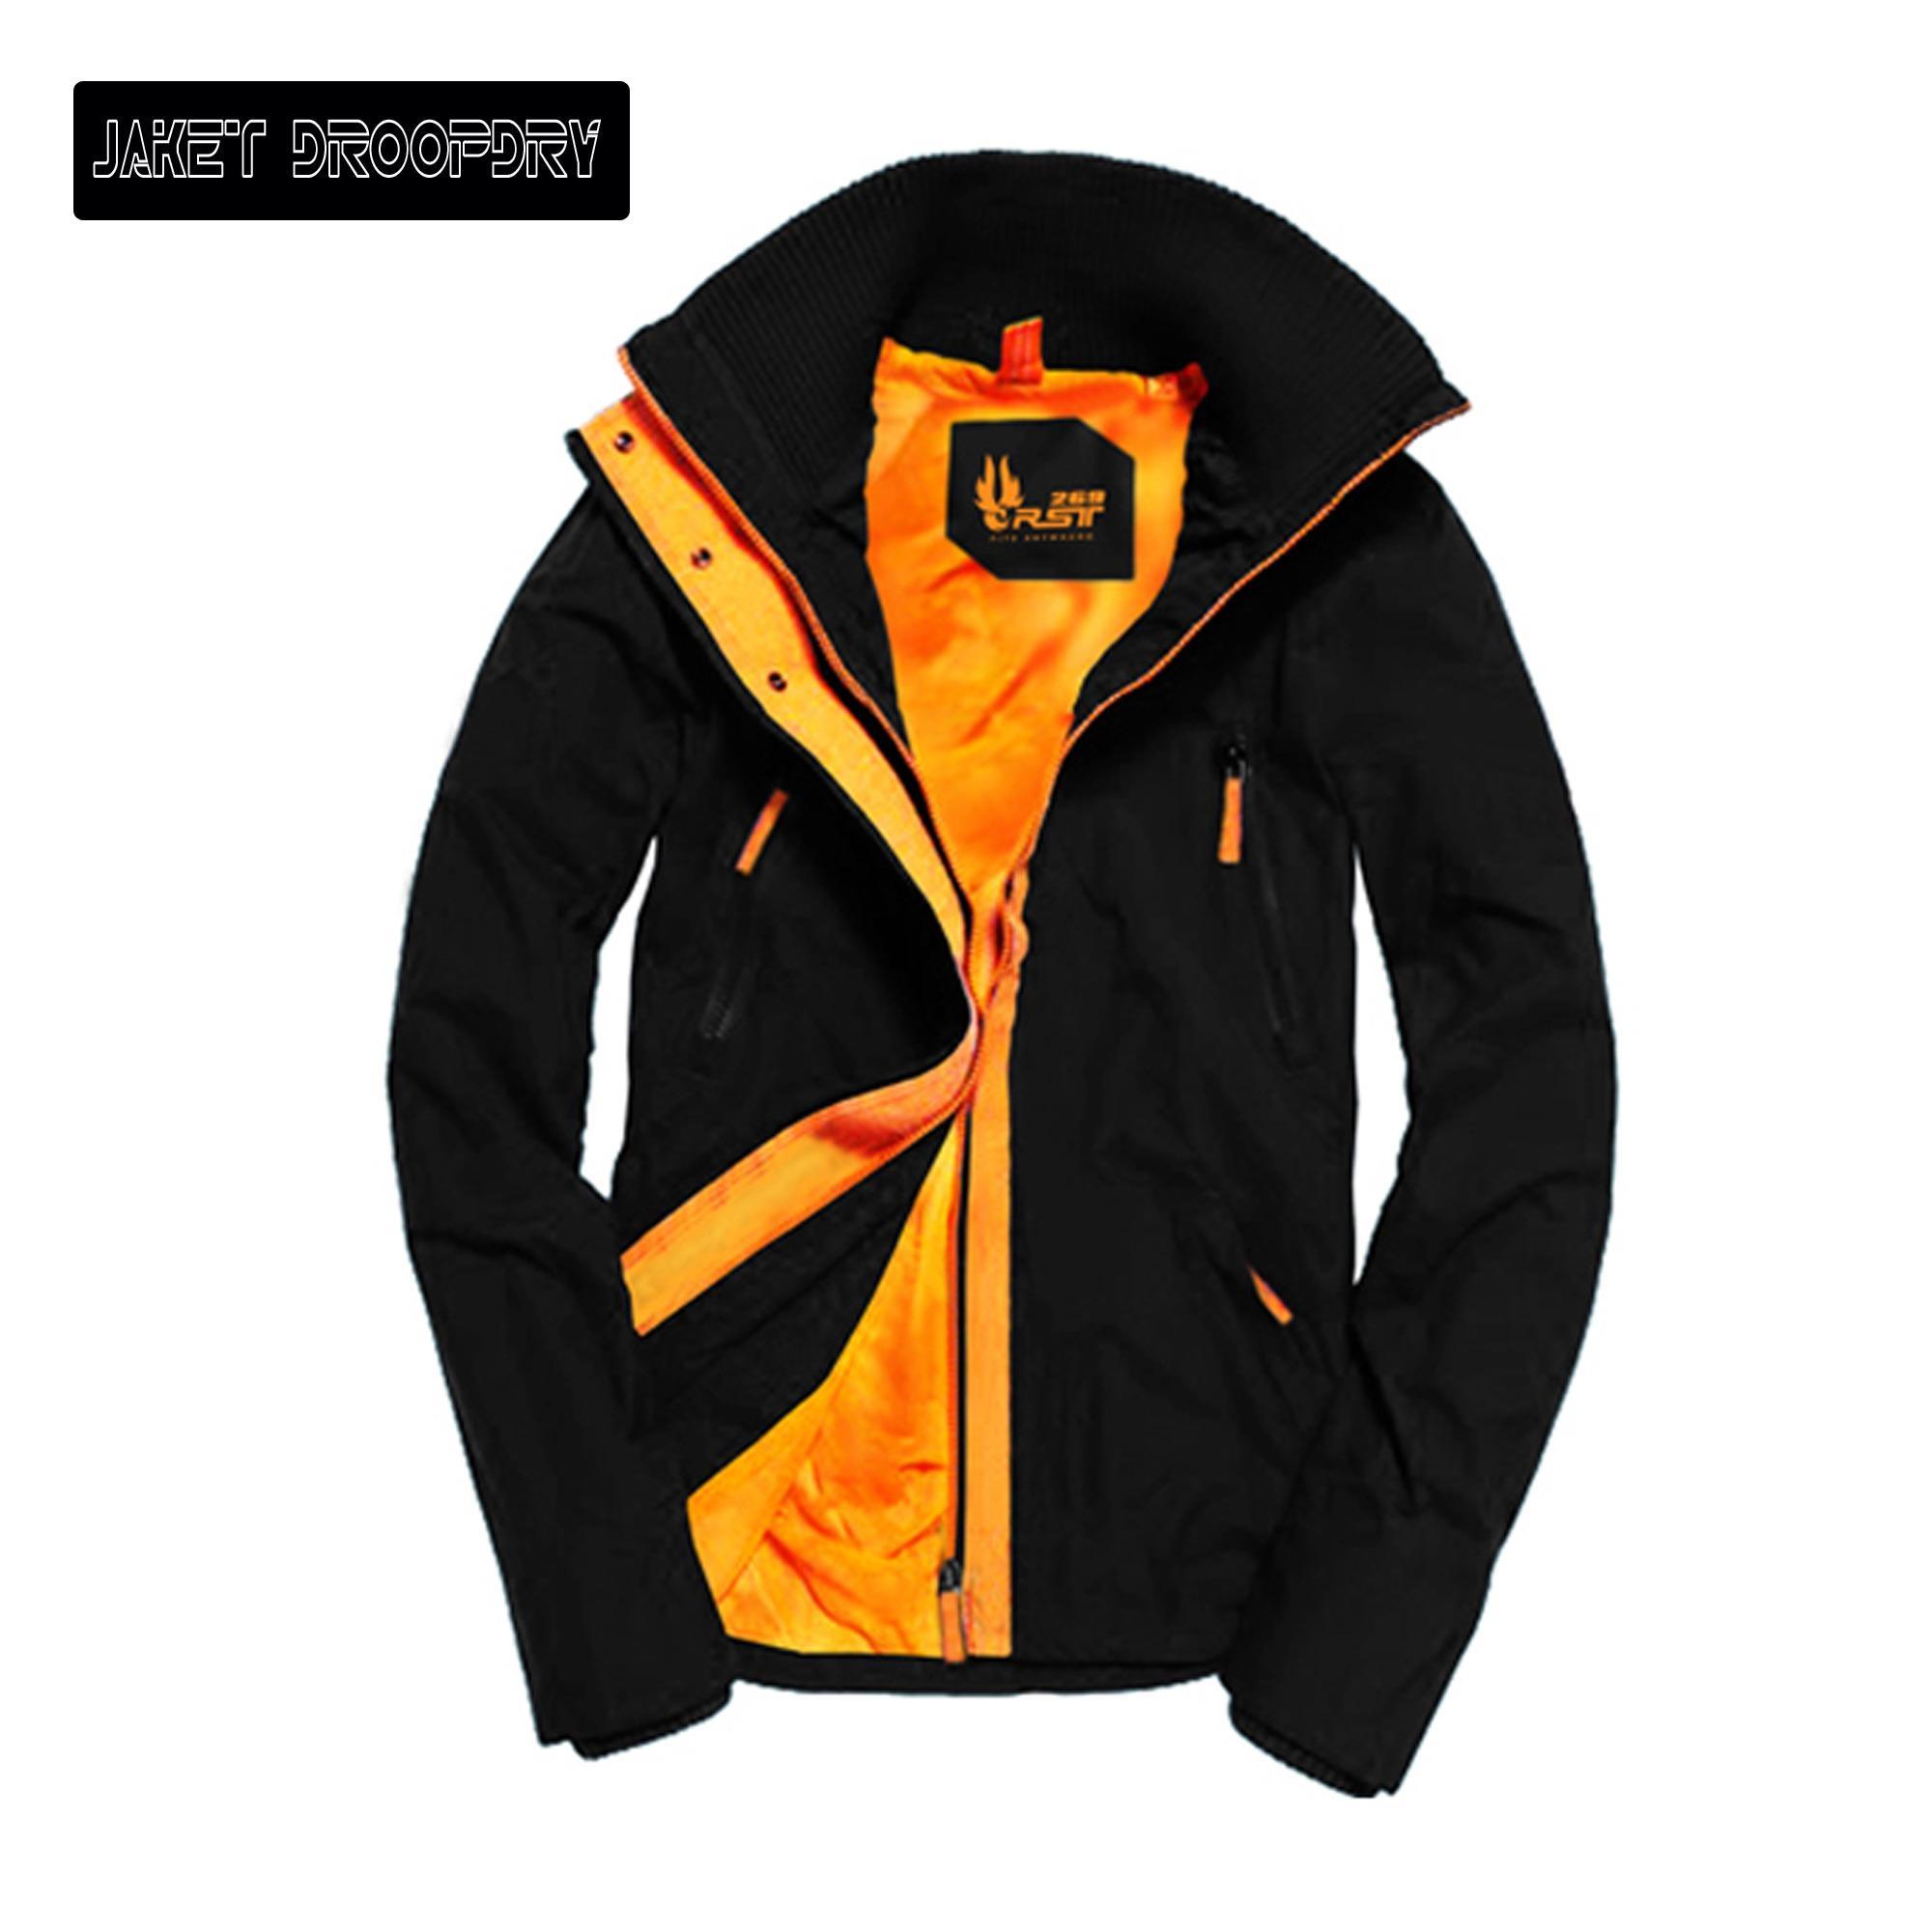 Jual Jaket Parka Pria Terbaru Parasut Nike Hijau Tosca Droopdry Bahan Mayer Waterproof Brand Distro Fashion Keren Tesedia 2 Warna